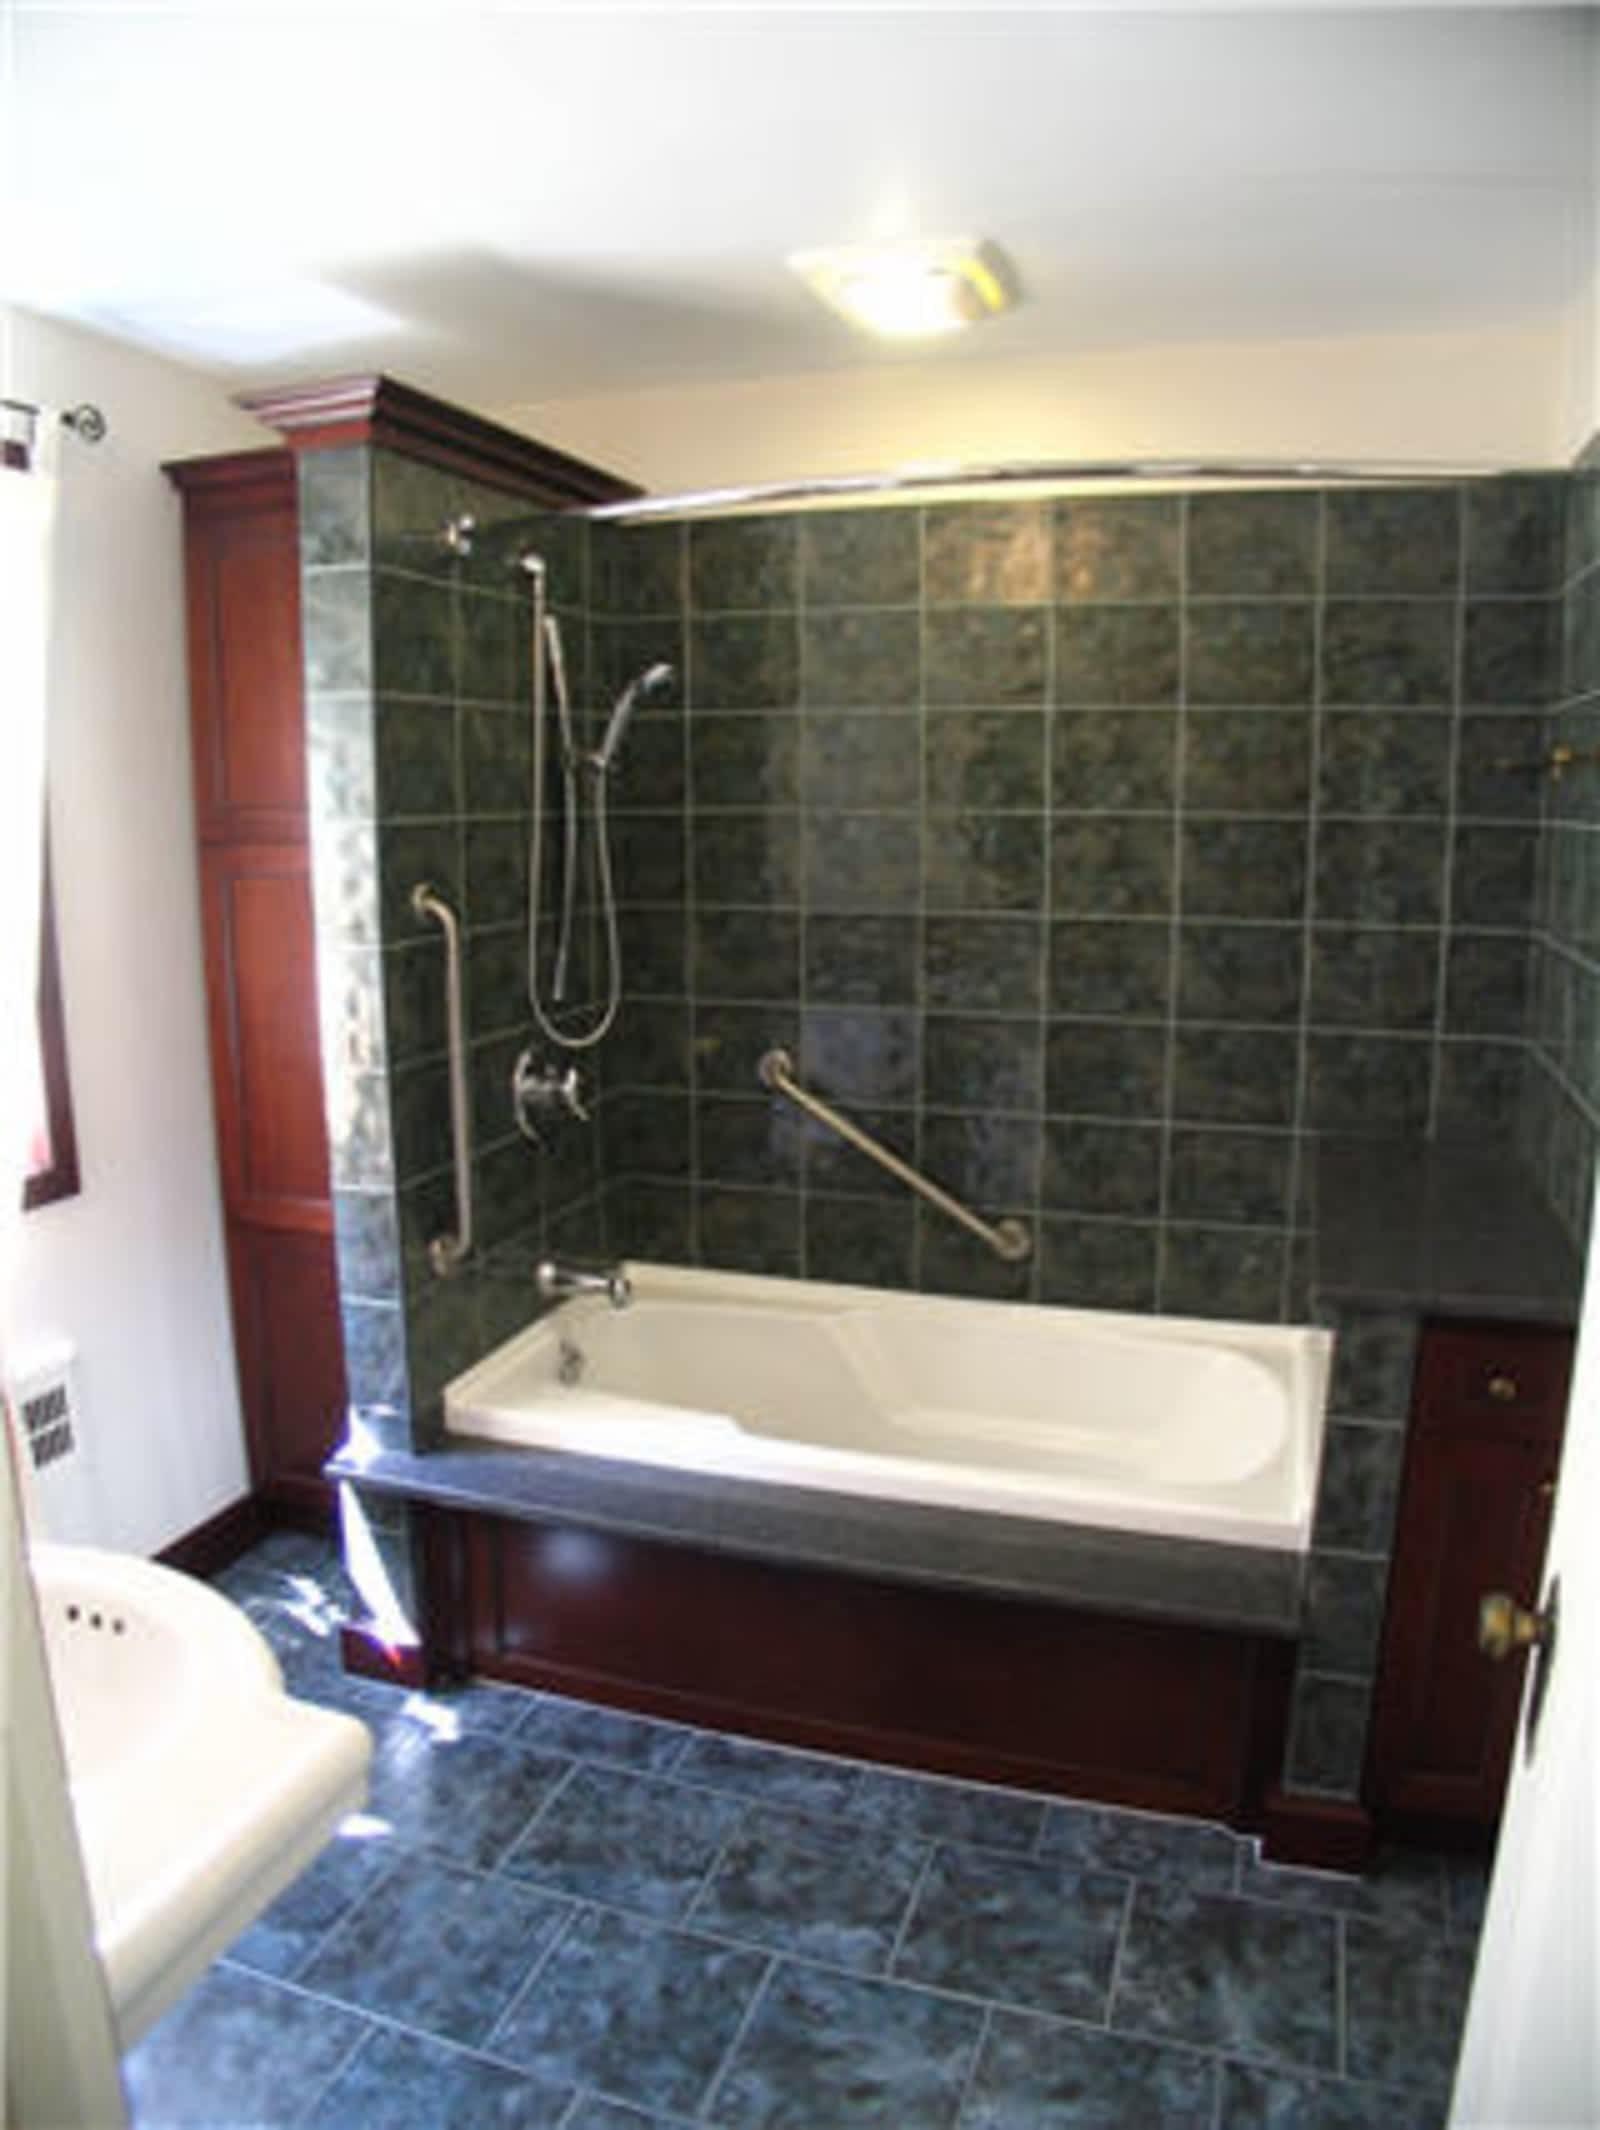 kitchen bath design tiny house appliances mckerlie centre opening hours 110 kendall st point edward on